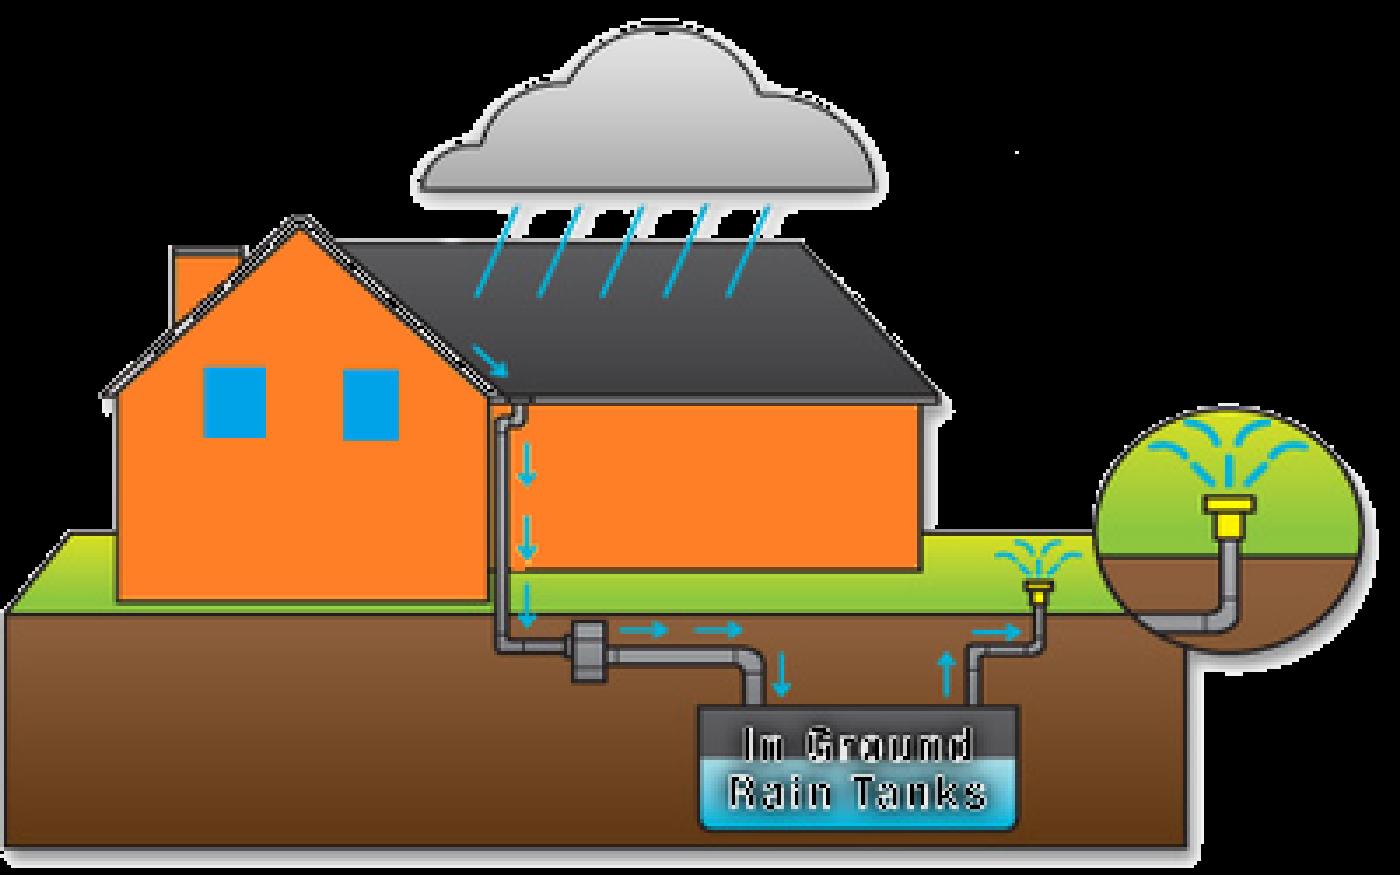 Rain water harvesting homework. Wheat clipart animated